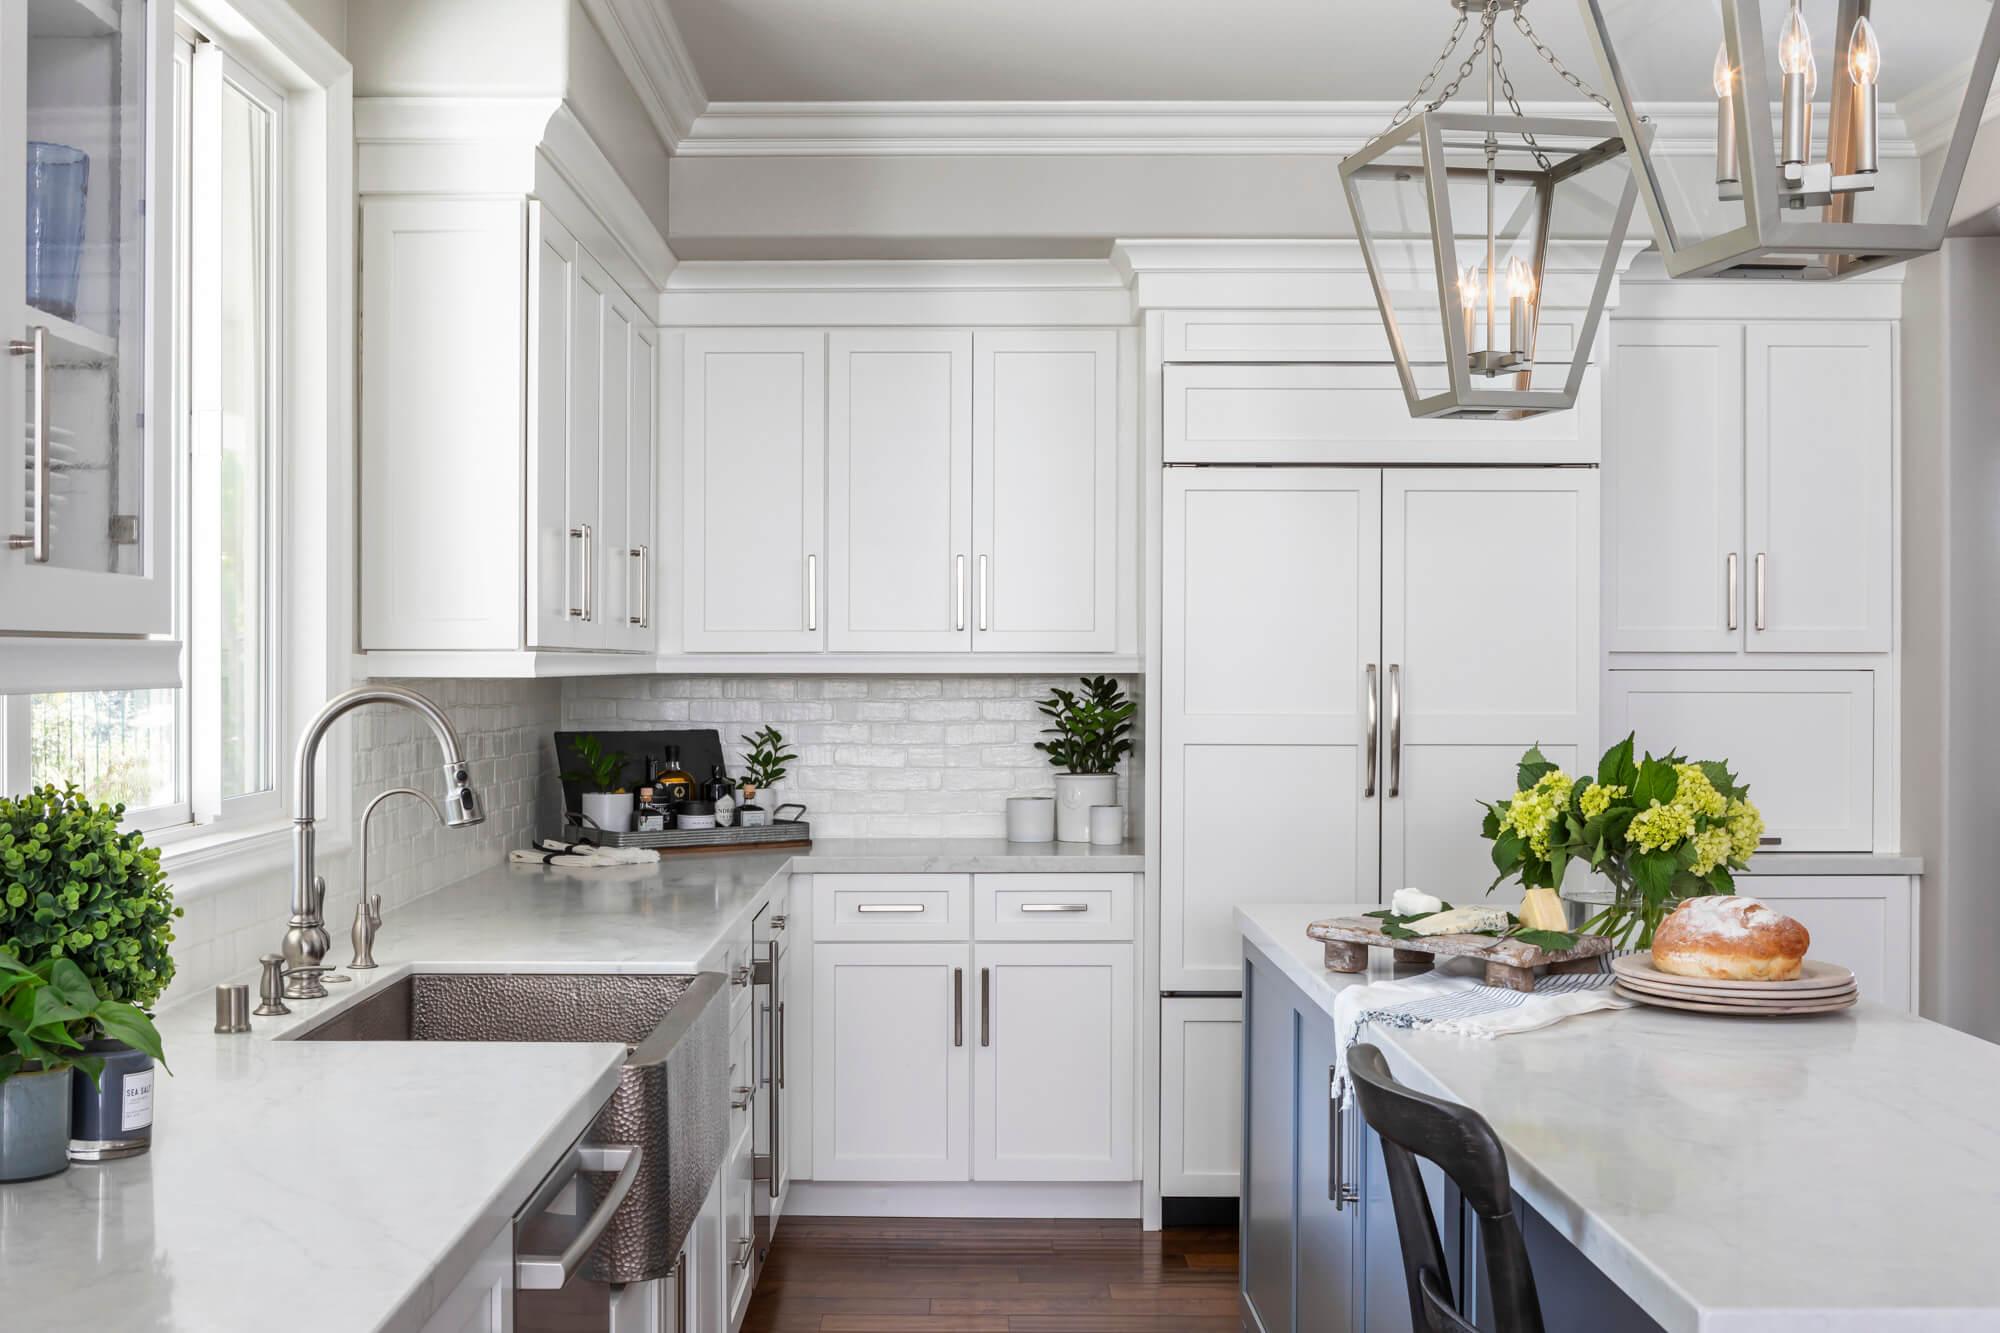 White kitchen and subway tile backsplash